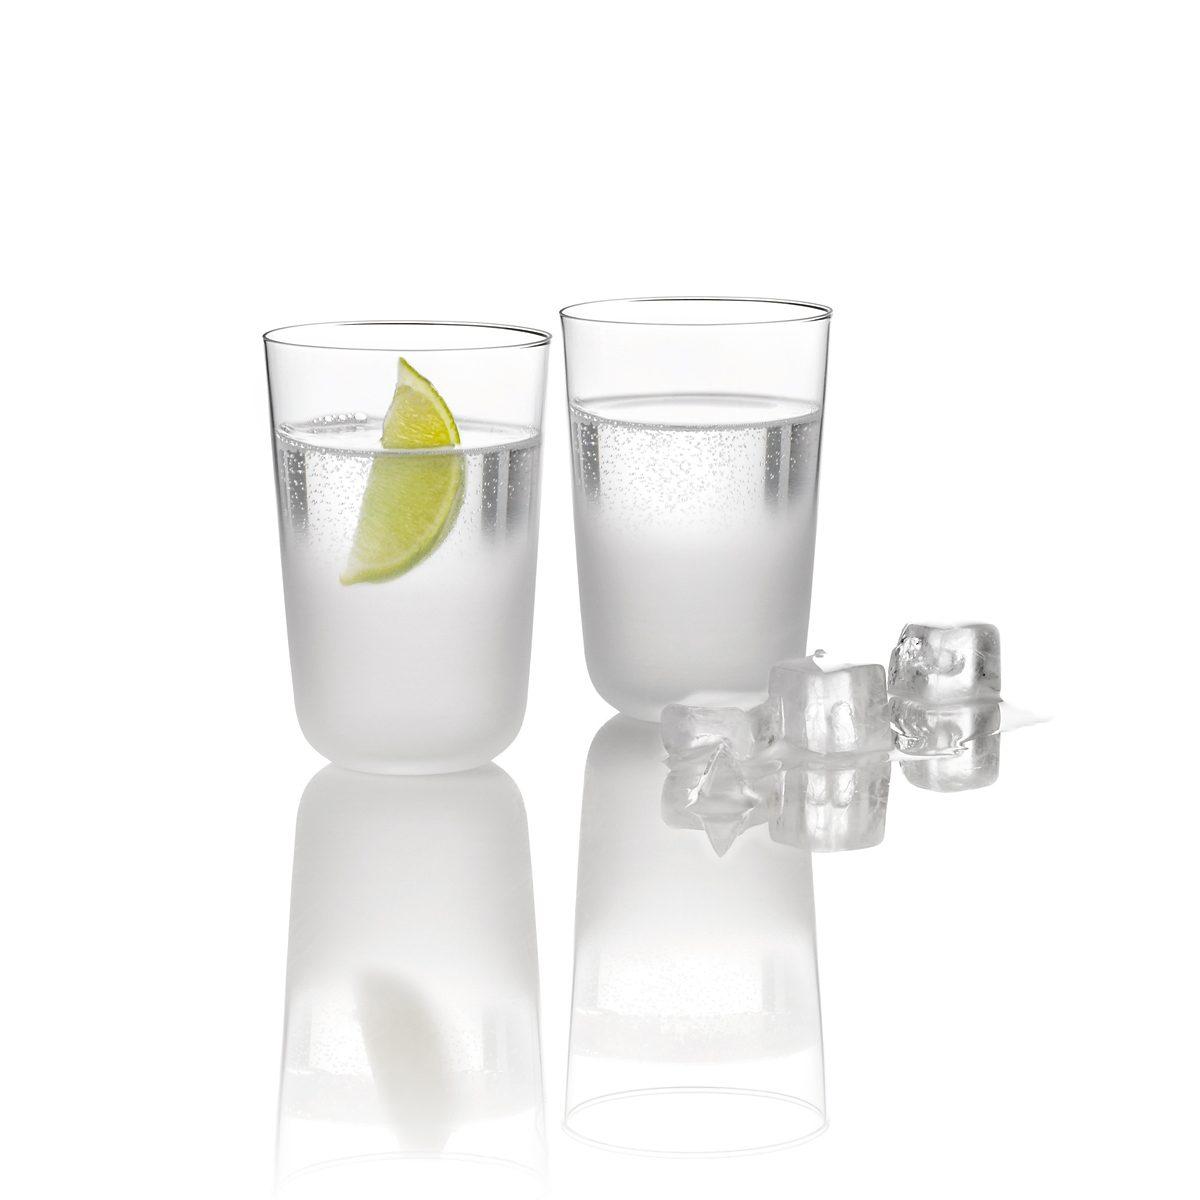 Stelton Stelton FROST Glas no. 1 - 2er Set